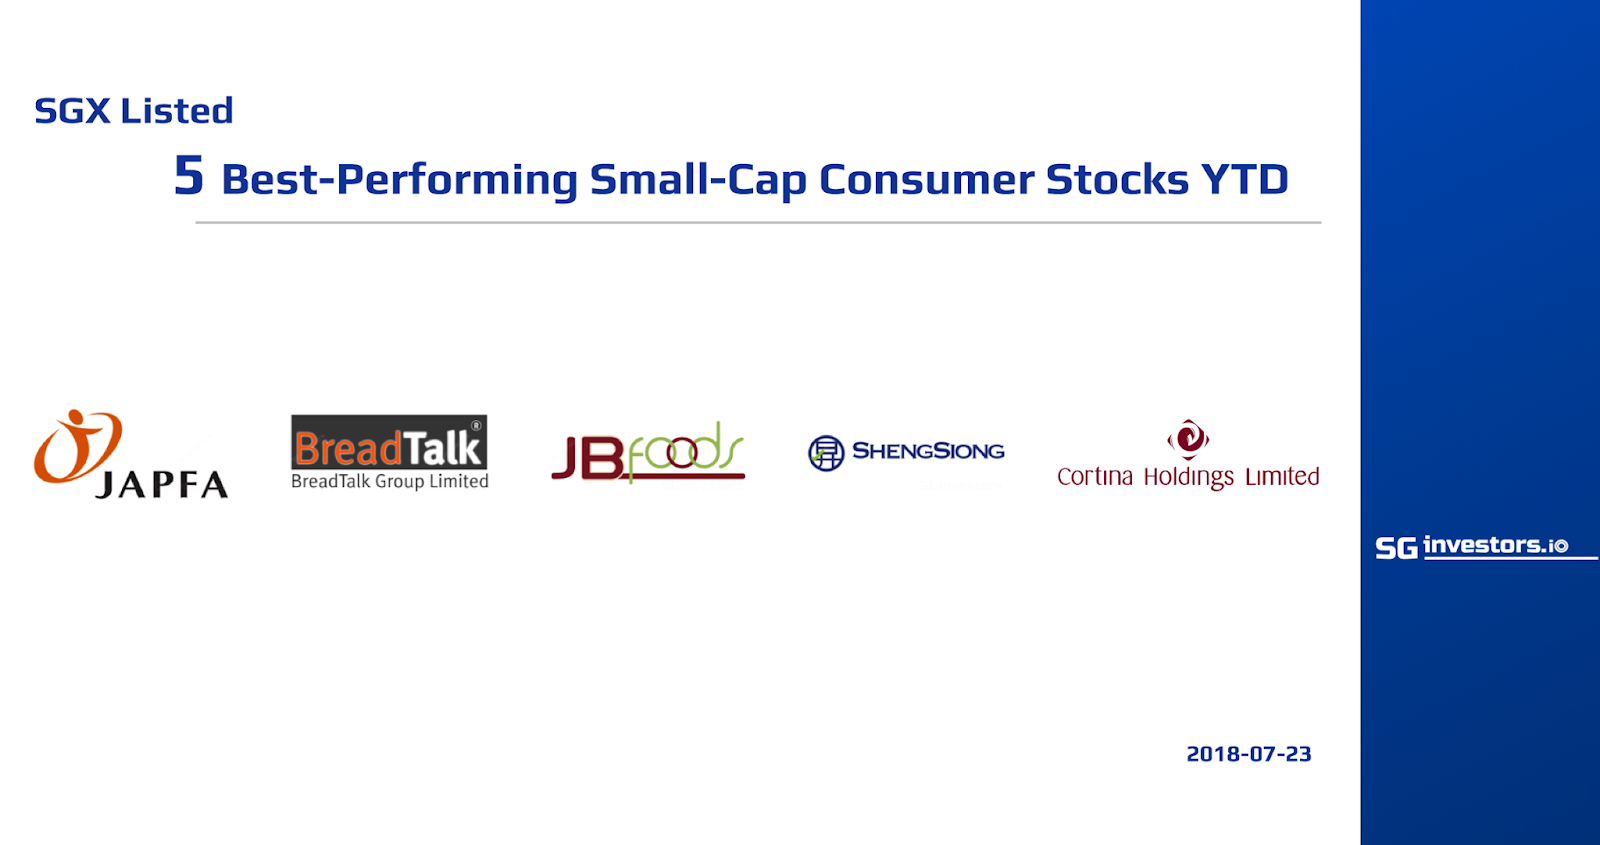 5 Best-Performing SGX Small-Cap Consumer Stocks Average 26 ...